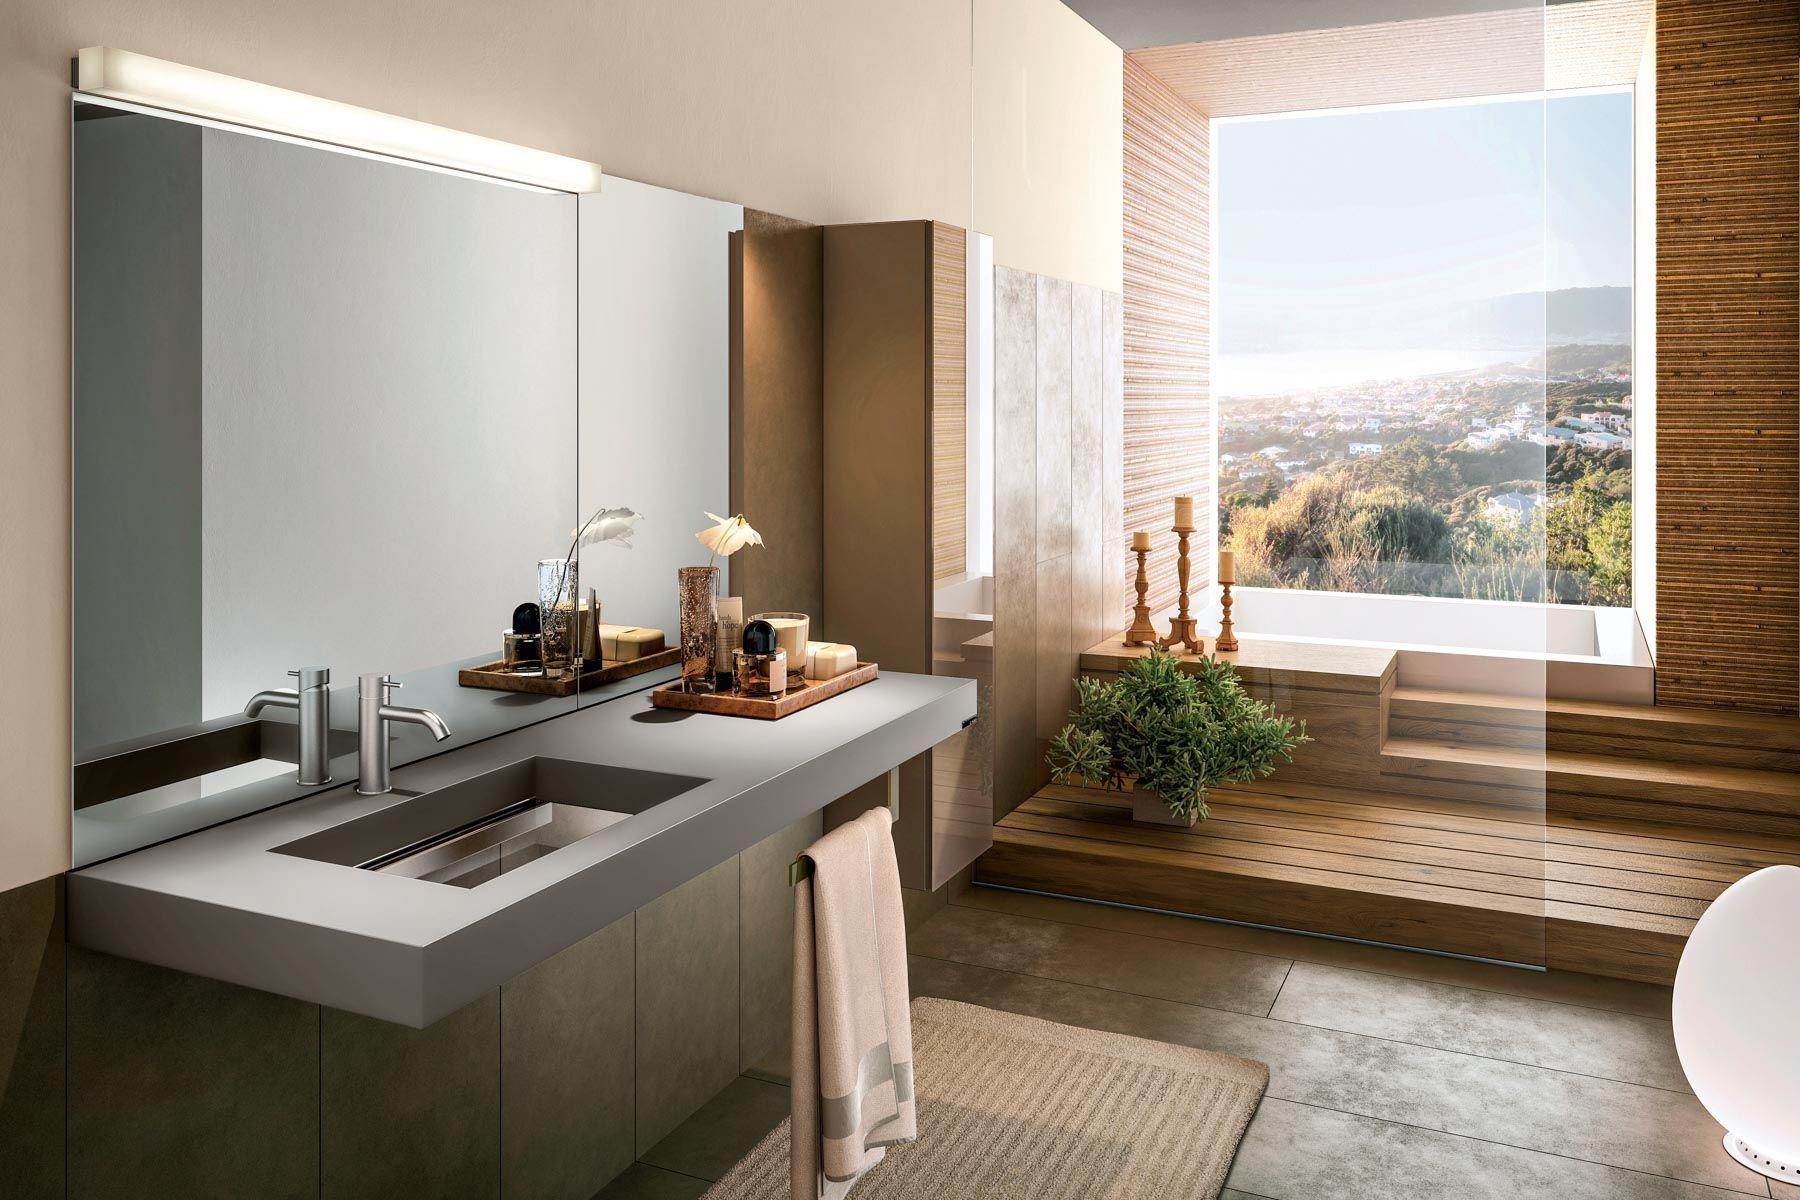 Salle de bain - Lavabo Depth